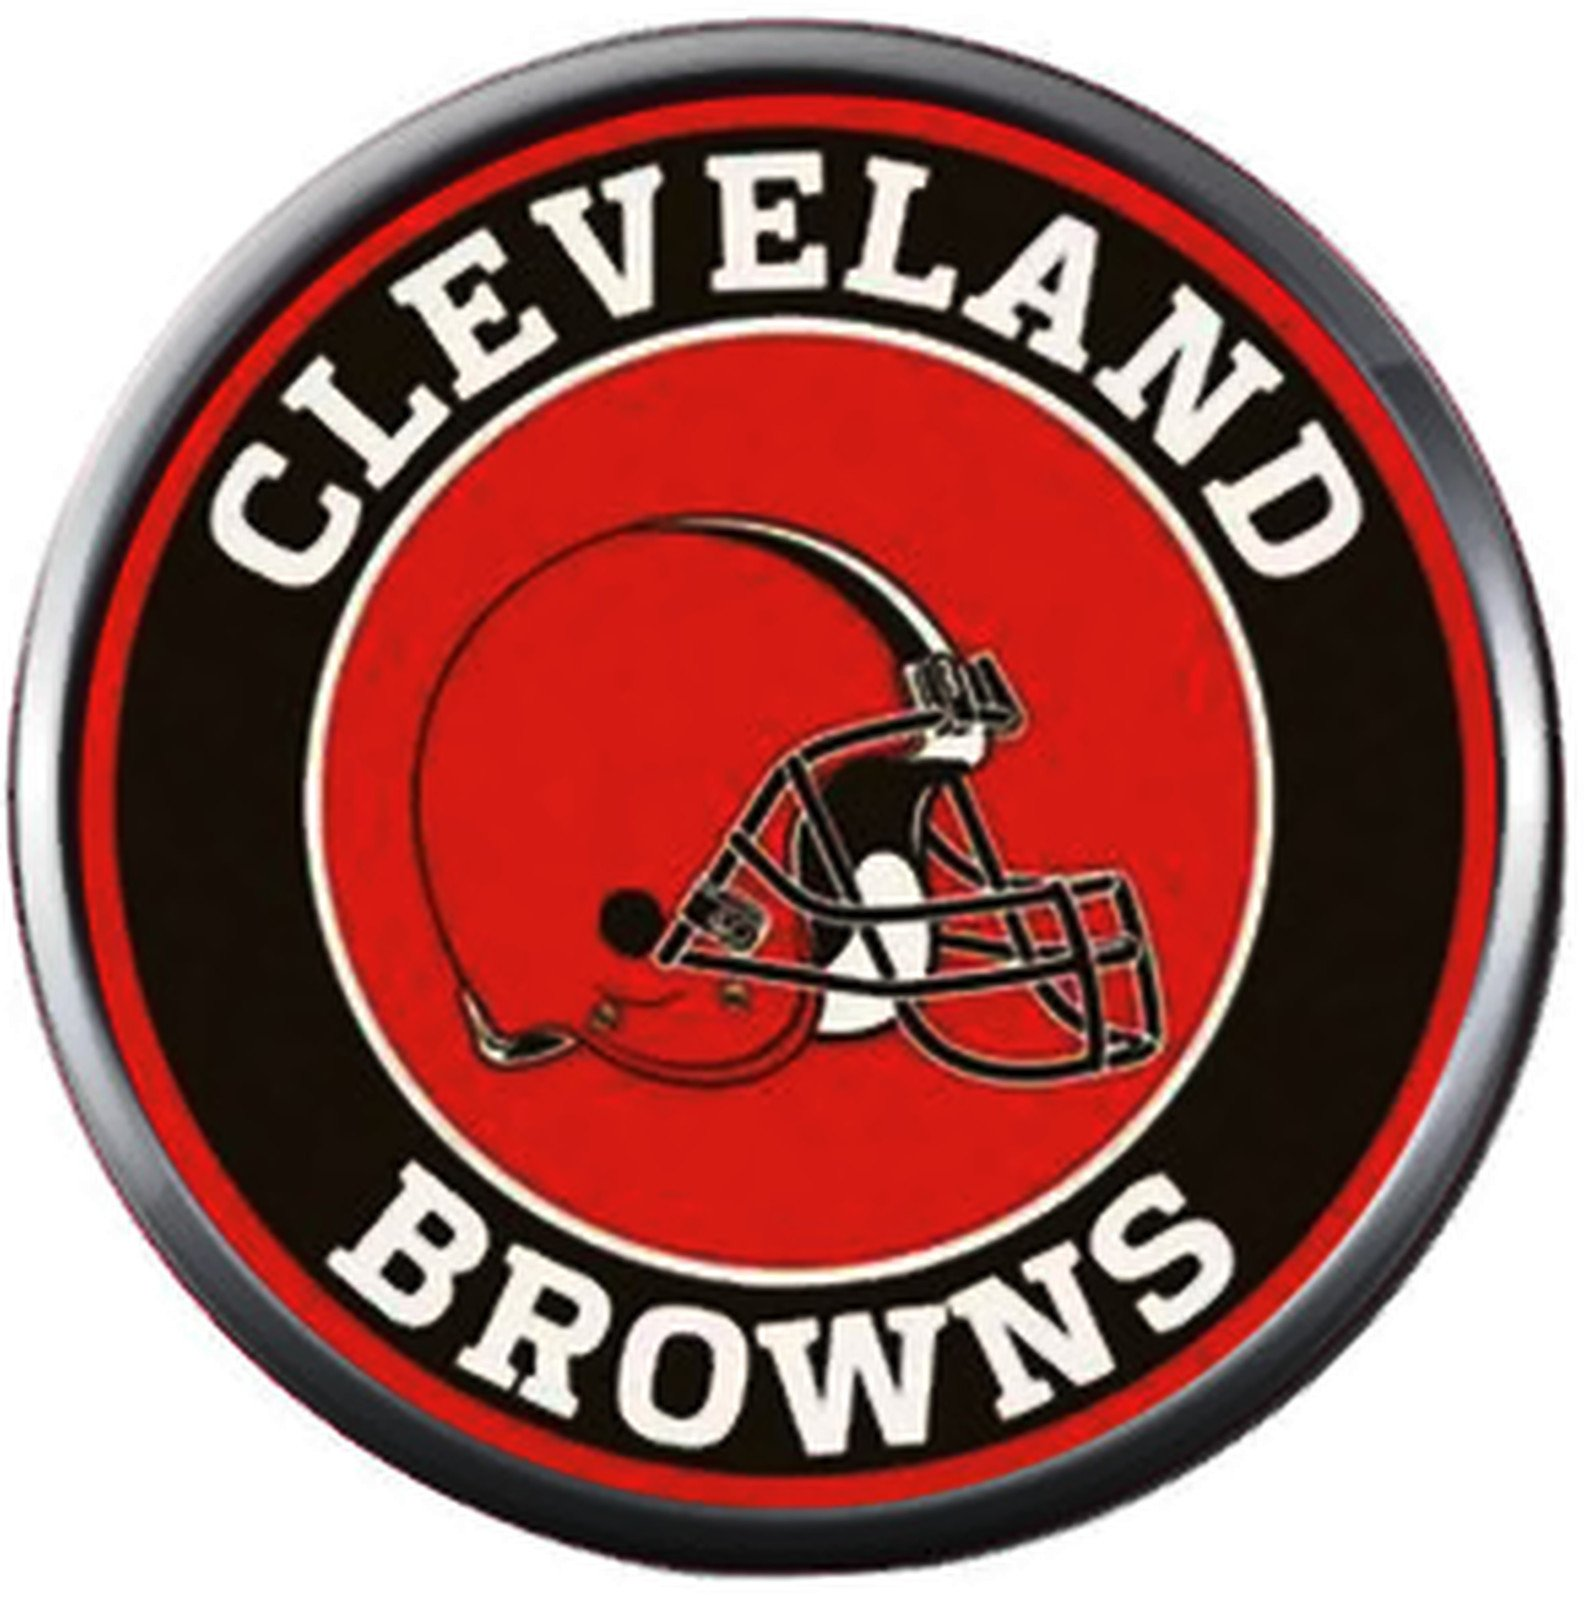 672b730f NFL Logo Cleveland Browns Vintage Circle Football Fan Team Spirit 18MM -  20MM Fashion Jewelry Snap Charm